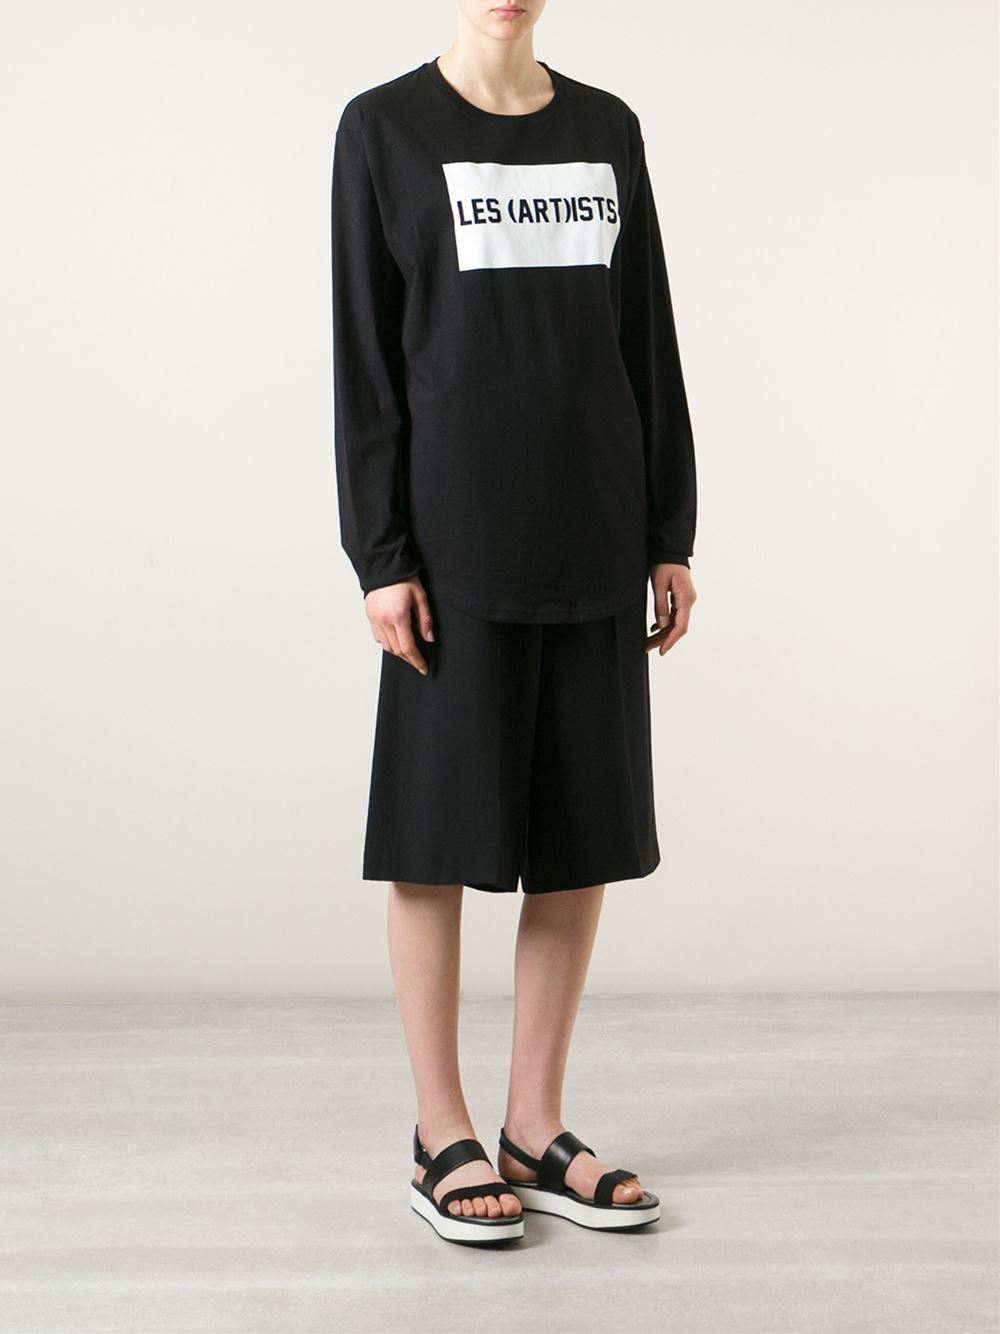 LES (ART)ISTS 'Dream Team Fashion' Sweatshirt in Black for Men